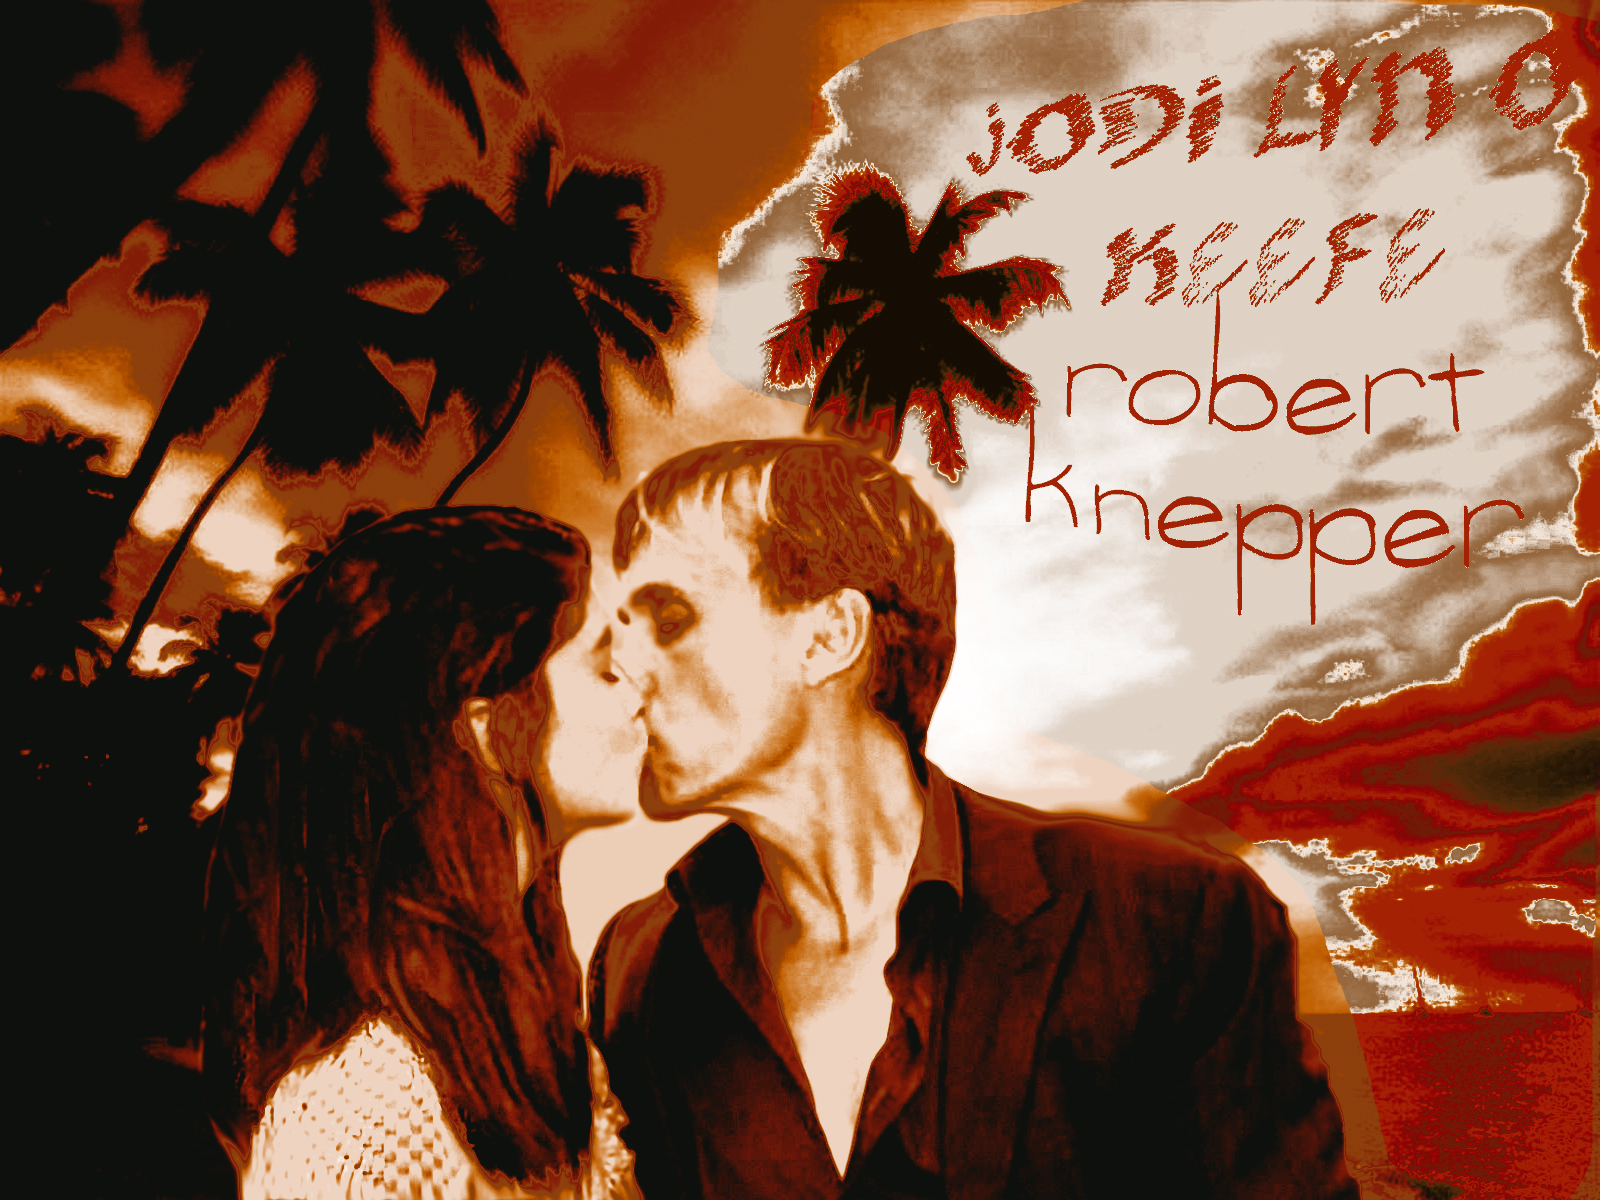 Robert Knepper/Jodi Lyn O'Keefe wallpaper